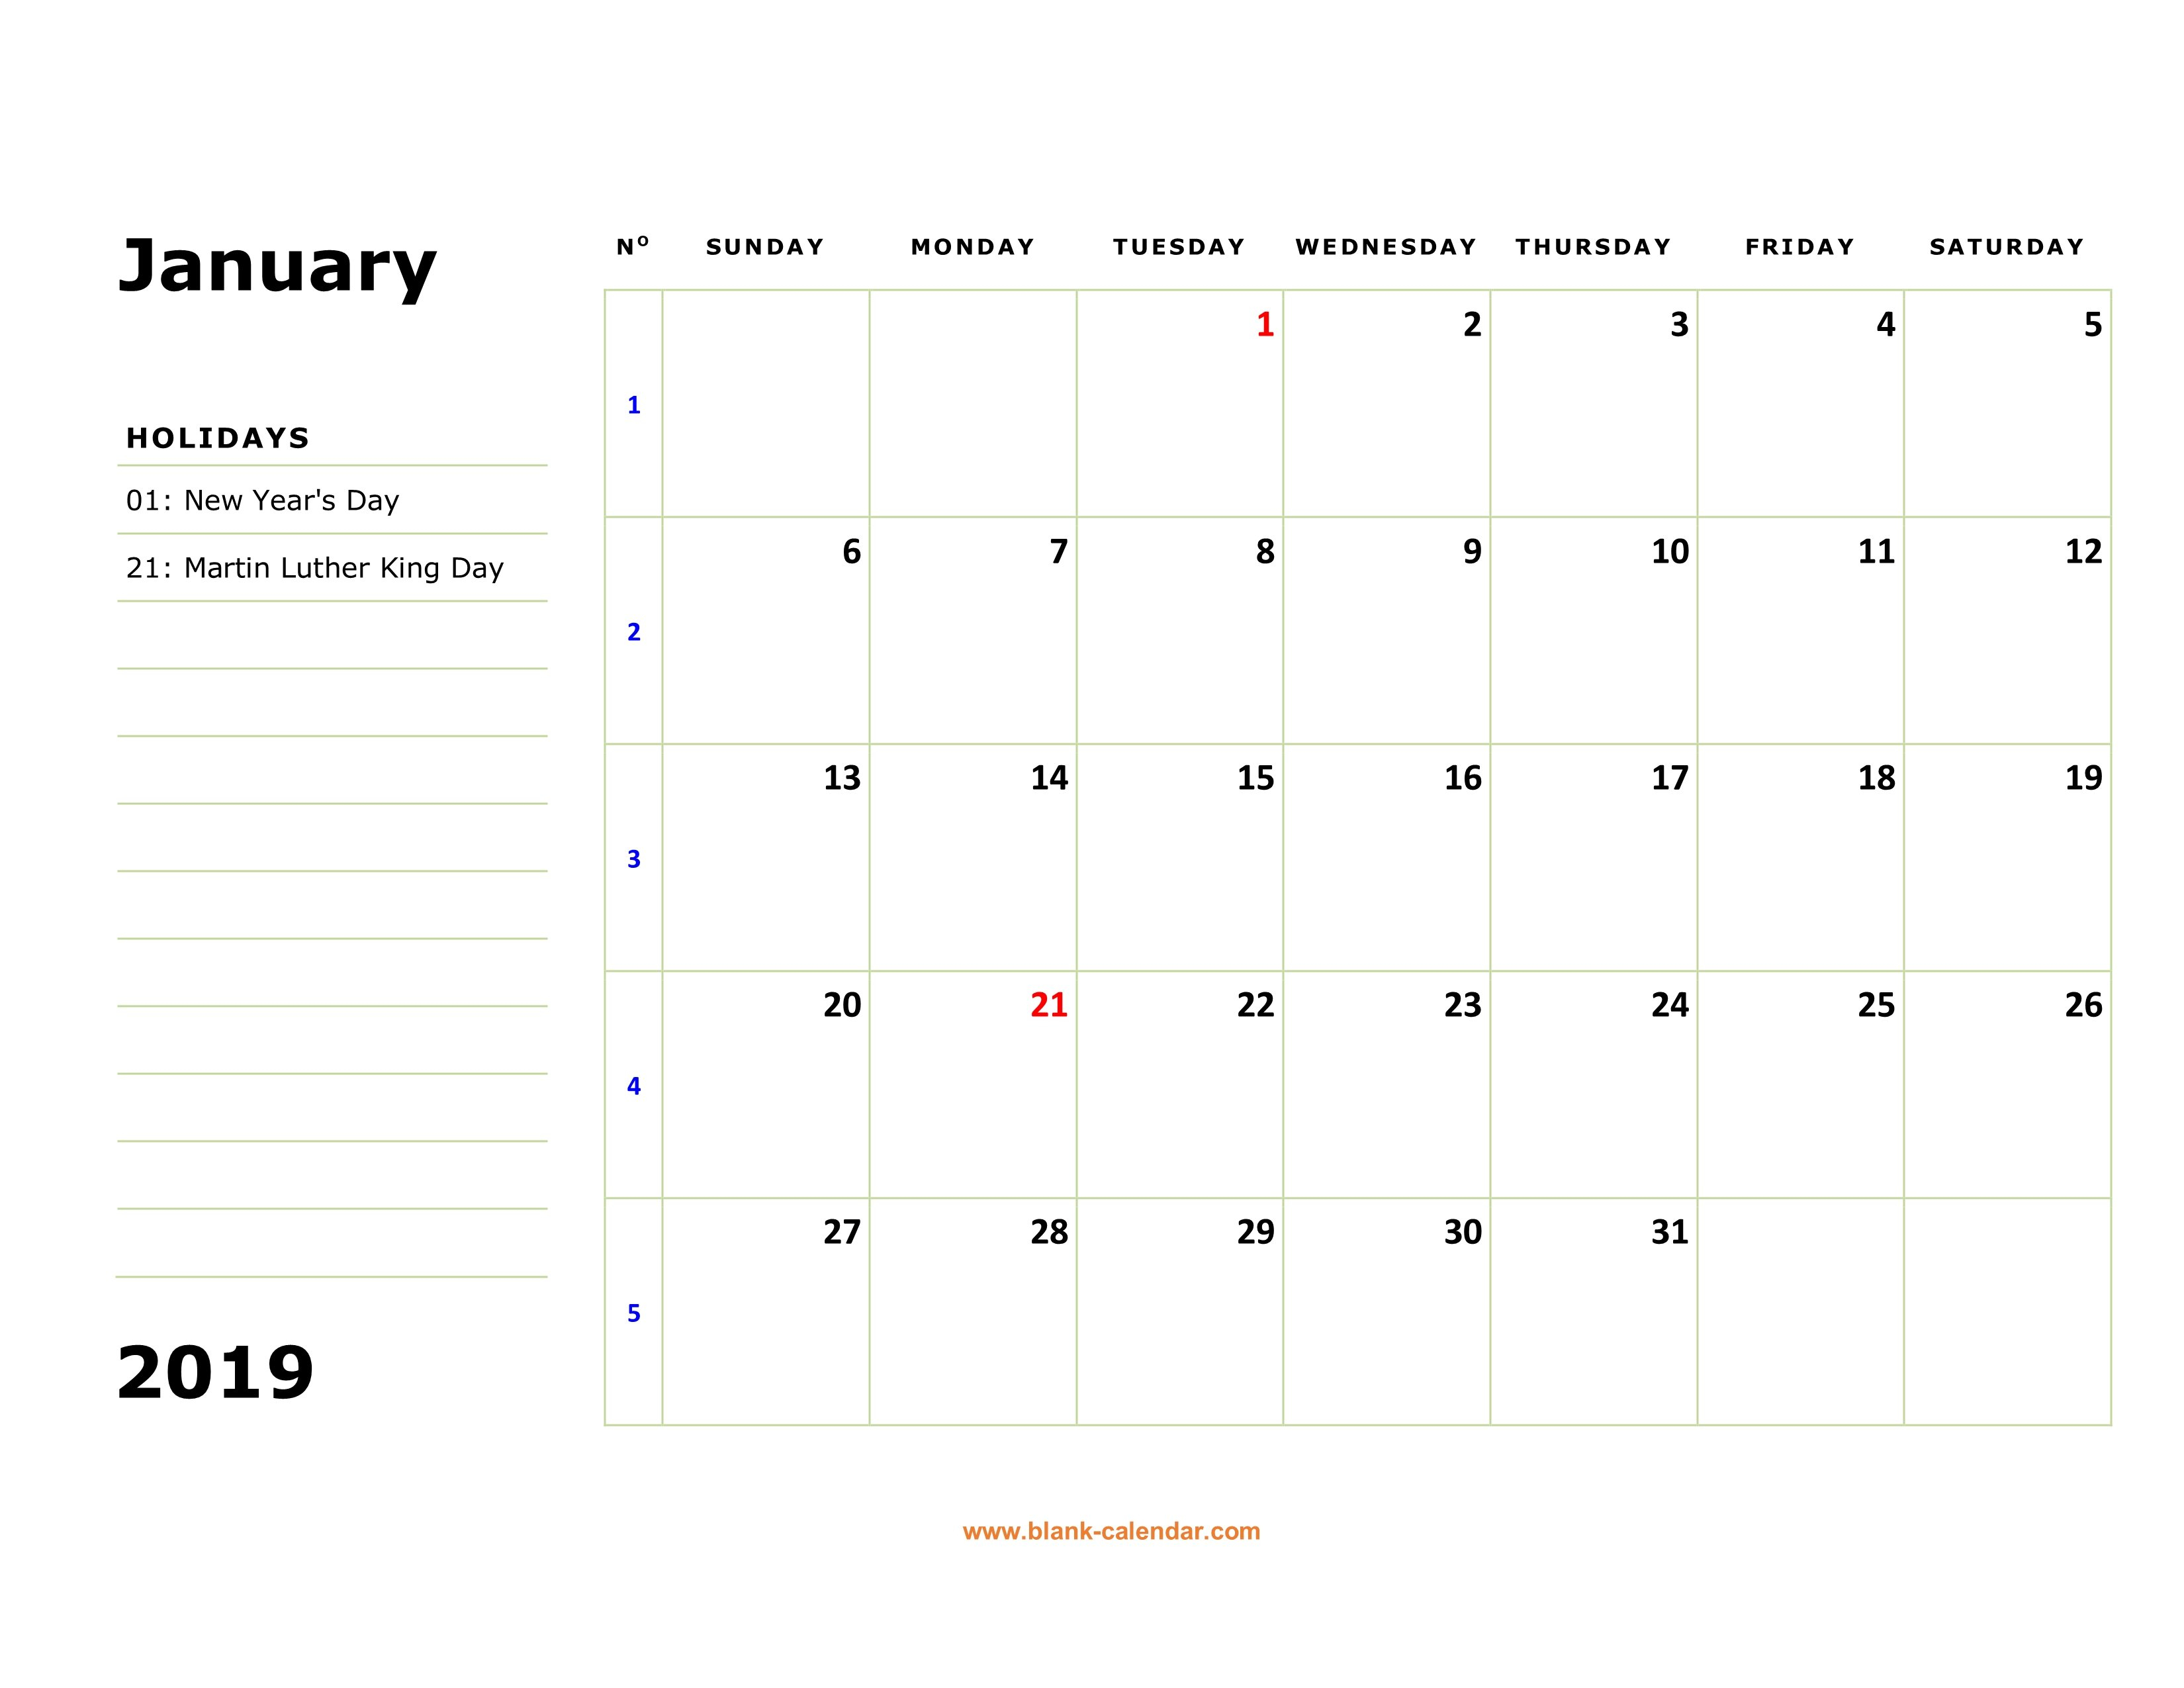 Free Download Printable Calendar 2019, Large Box, Holidays Listed Calendar 2019 Large